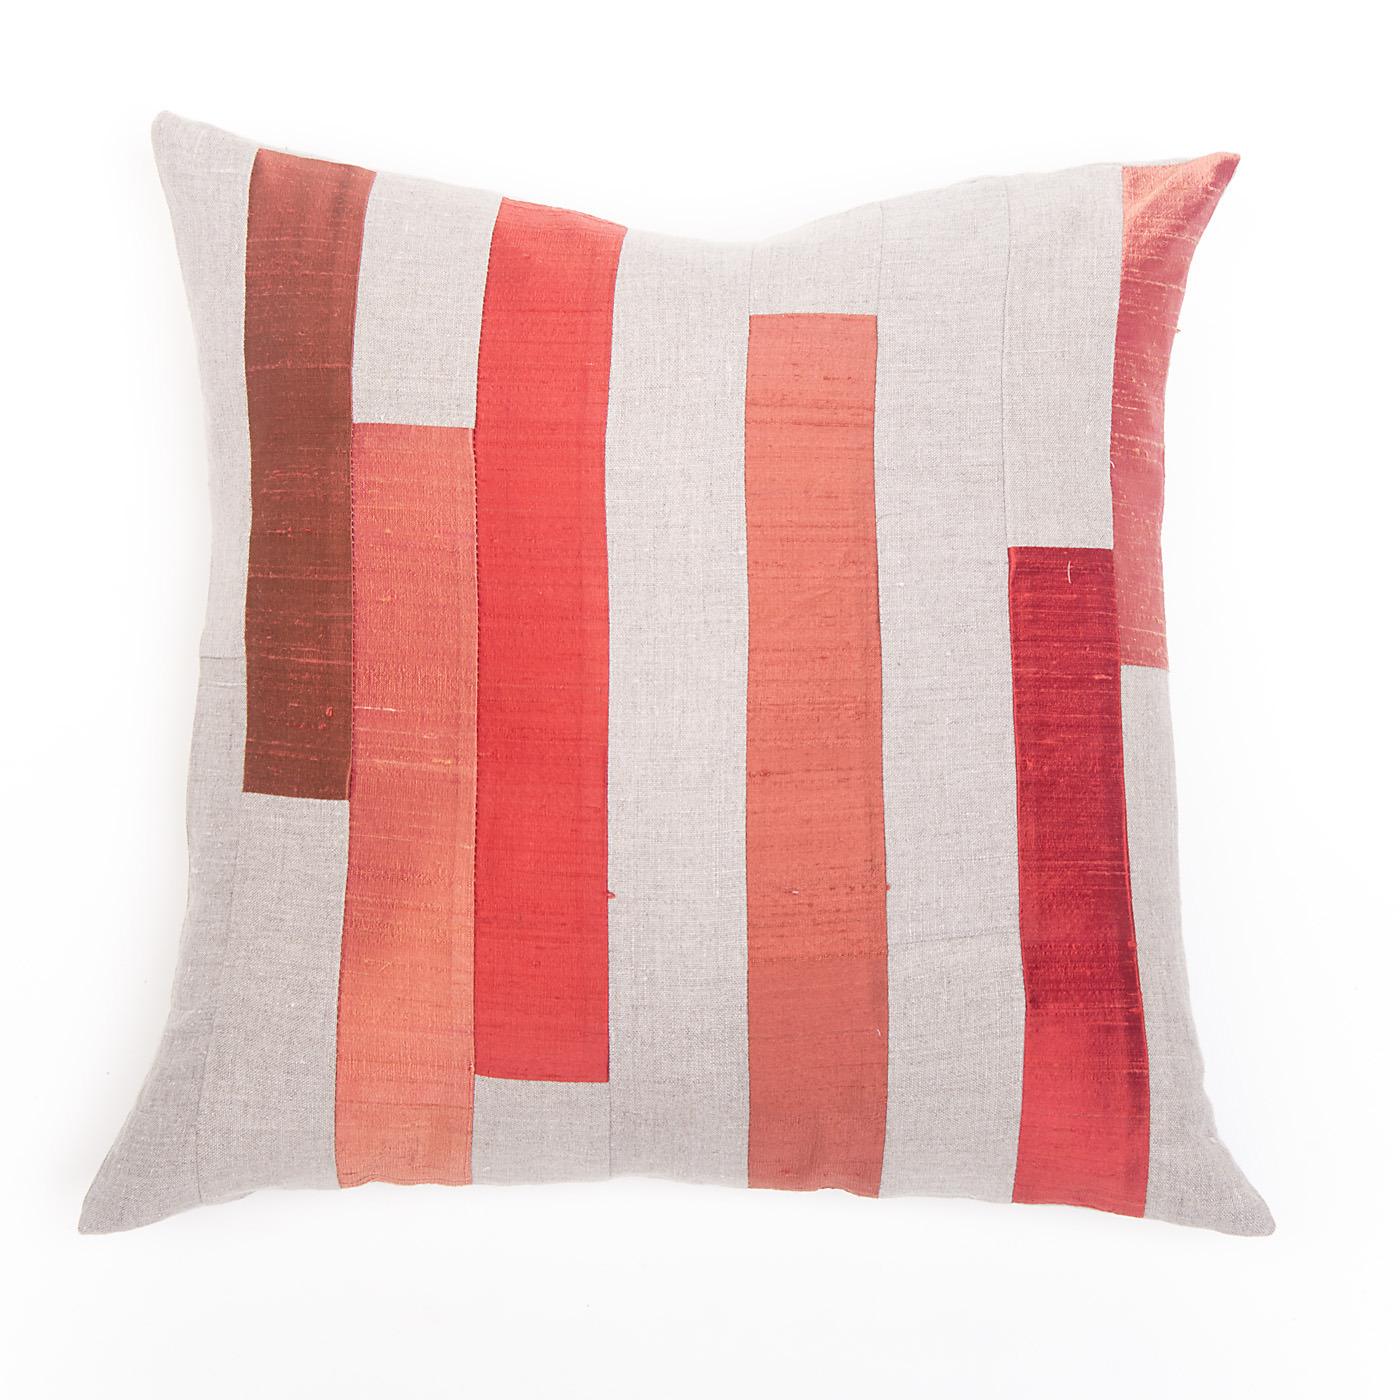 "Artisan, Eco-Friendly, Designer Silken Stripes Pillow 18"" x 18"""